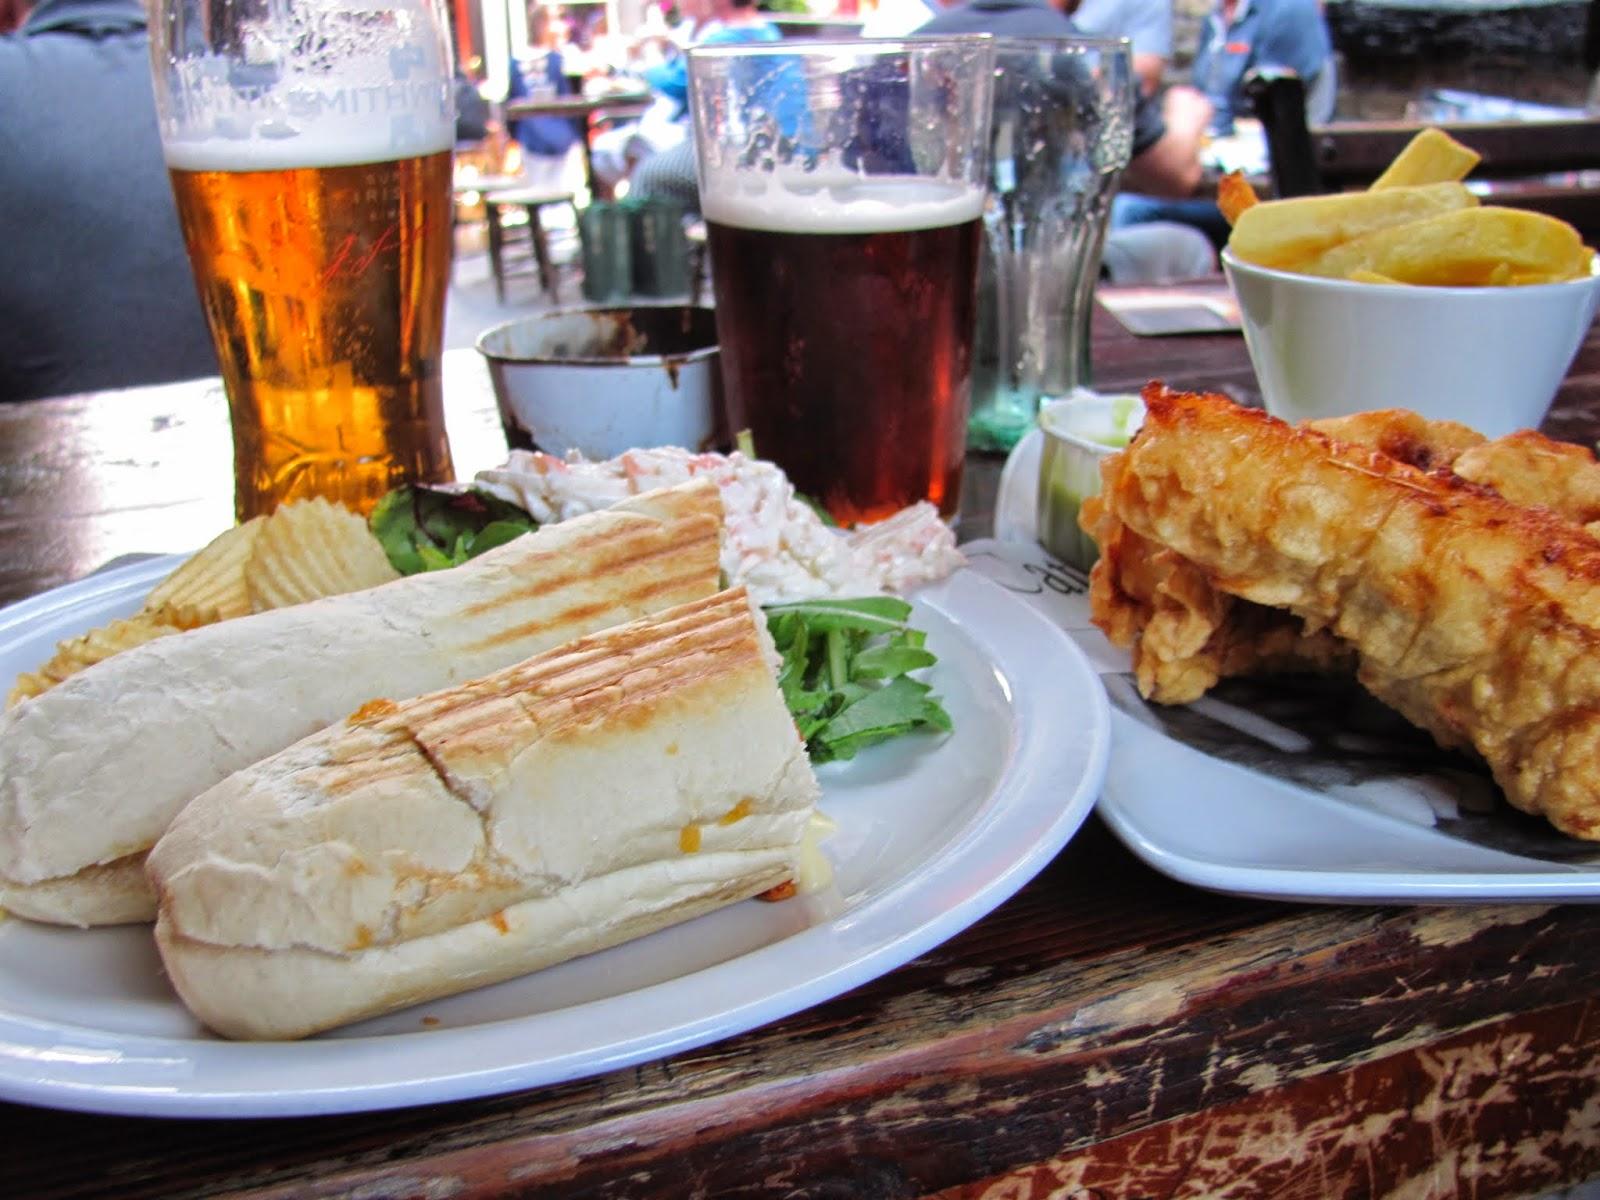 Lunch at Brazen Head Dublin, Ireland